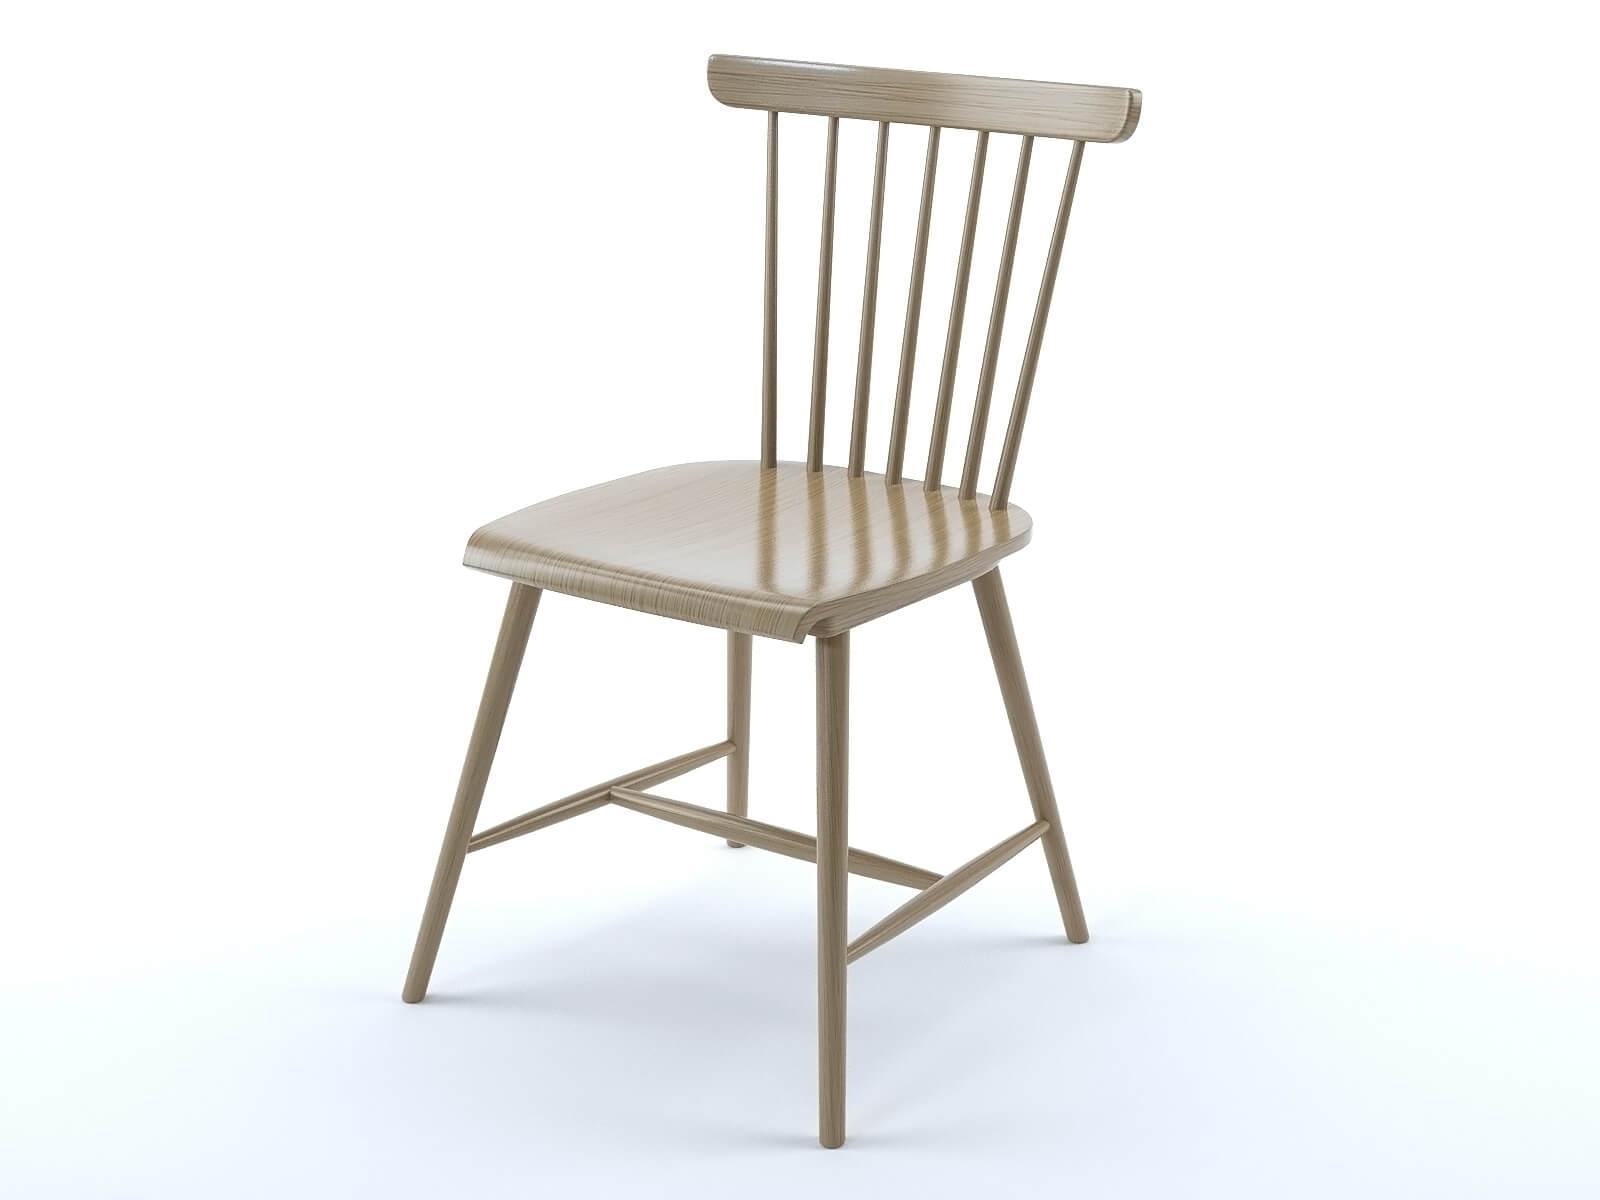 Deauville chair